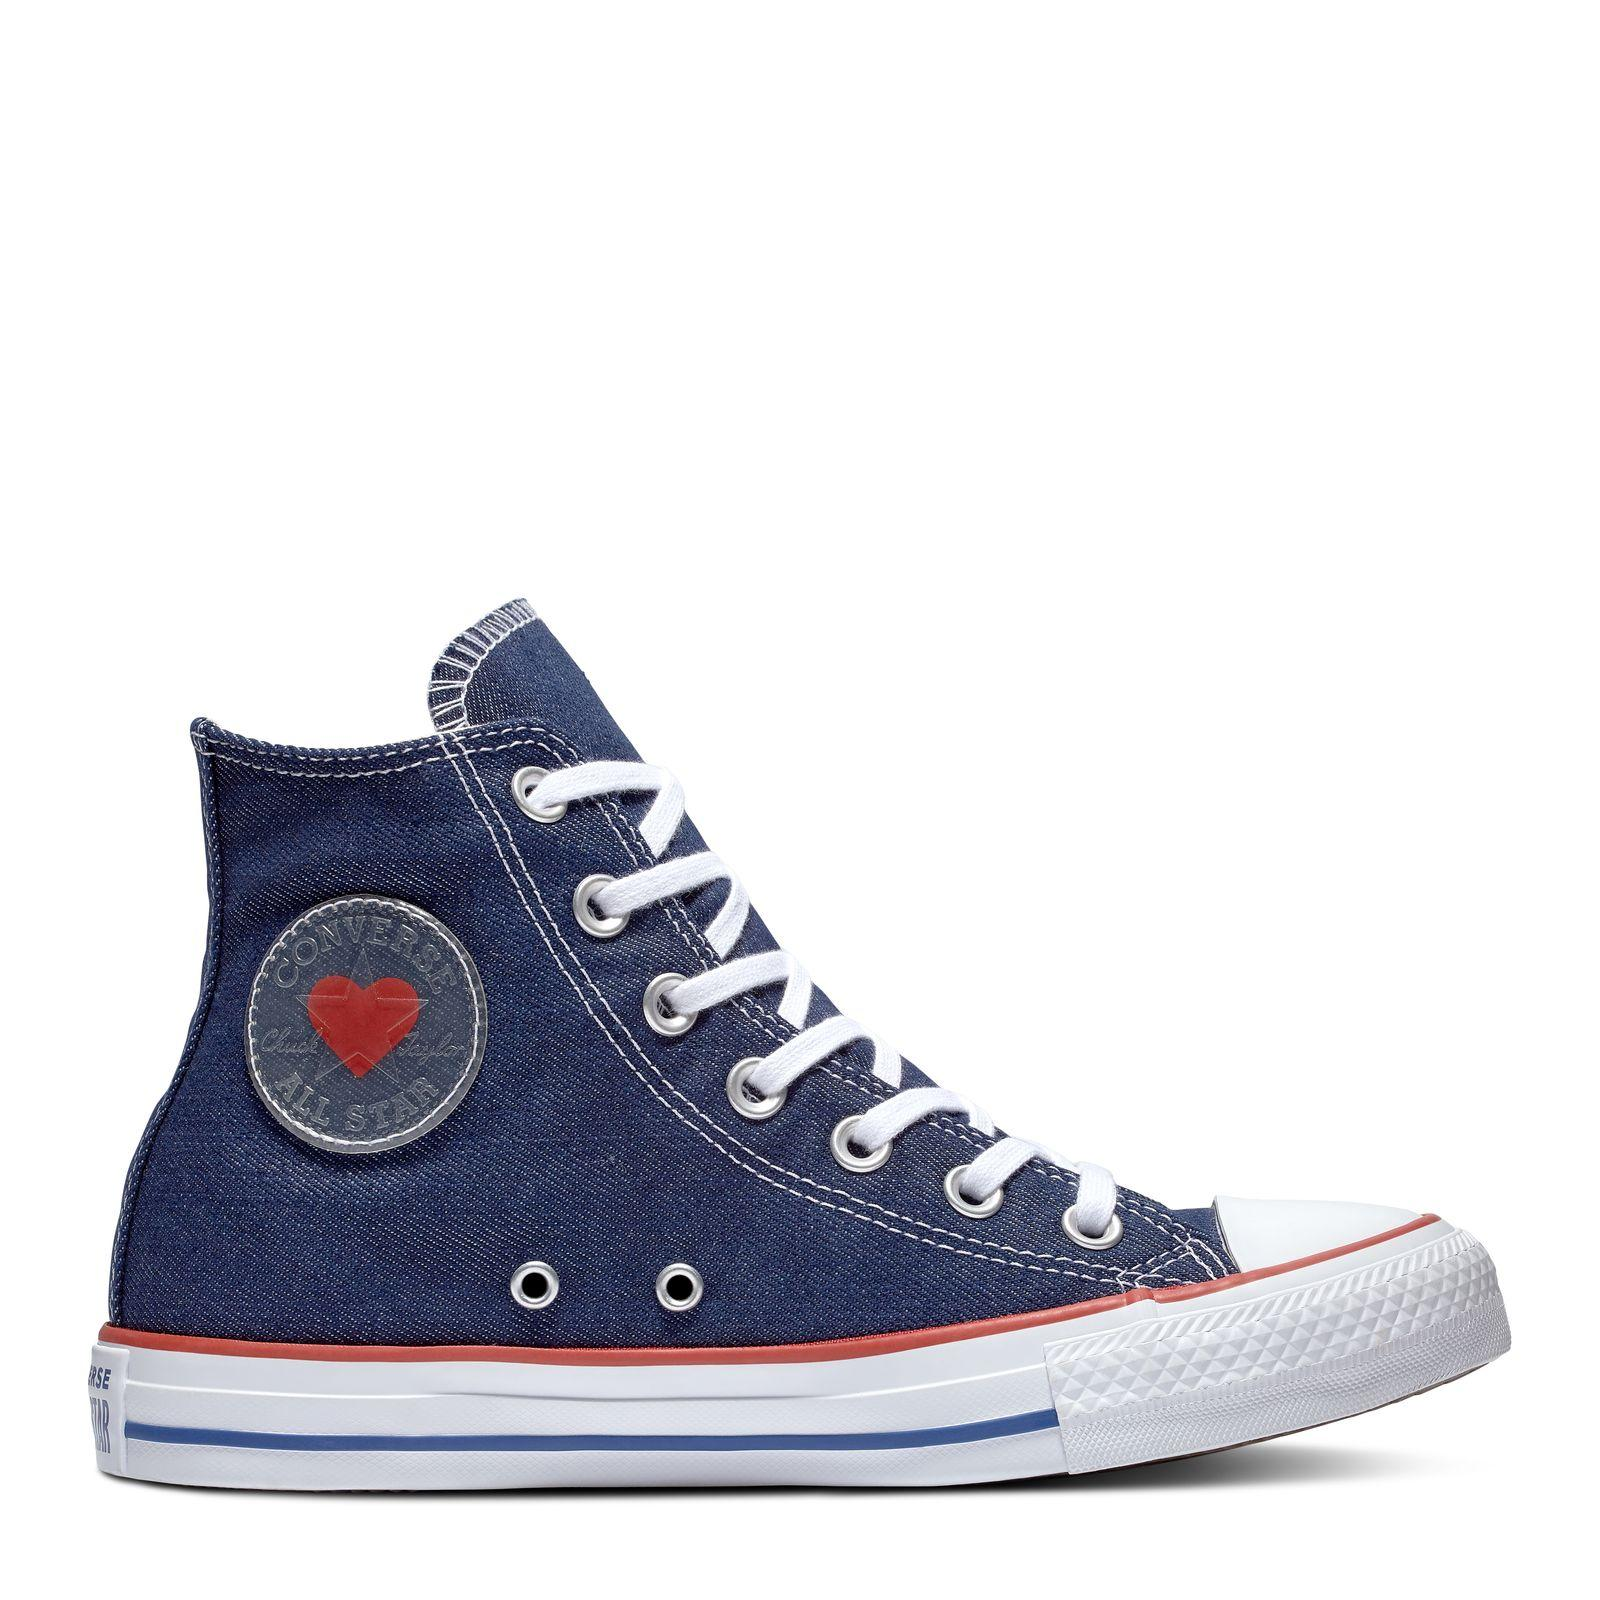 58e8f03ba6a1 CONVERSE CHUCK TAYLOR ALL STAR DENIM LOVE HI - INDIGO ENAMEL RED BLUE -